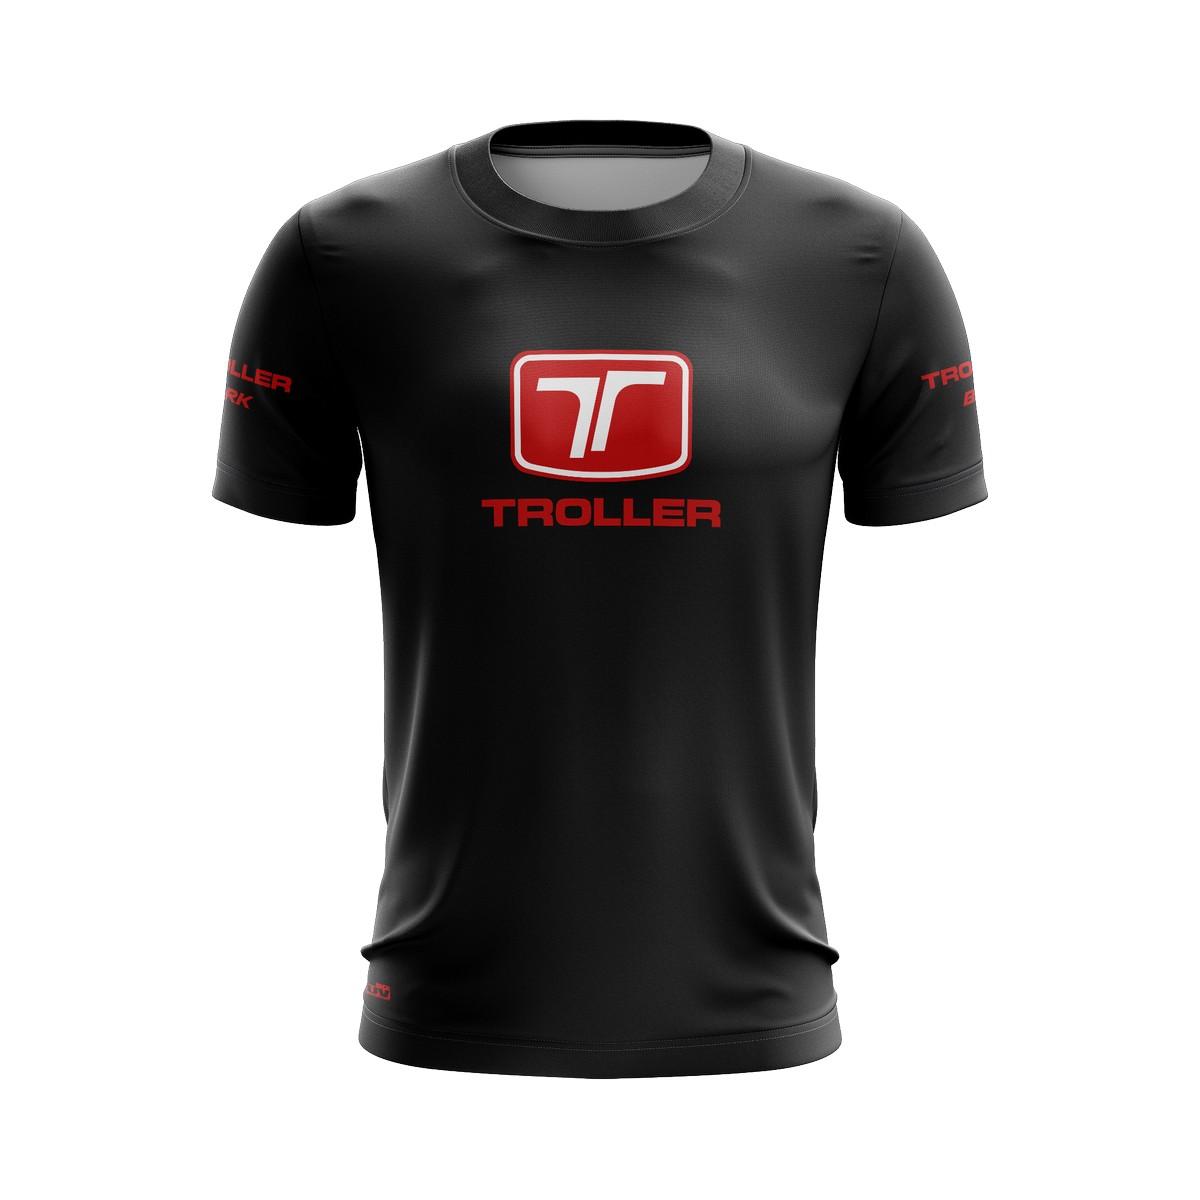 Camiseta Troller Casual 02 Brk Off Road Tecido Dry